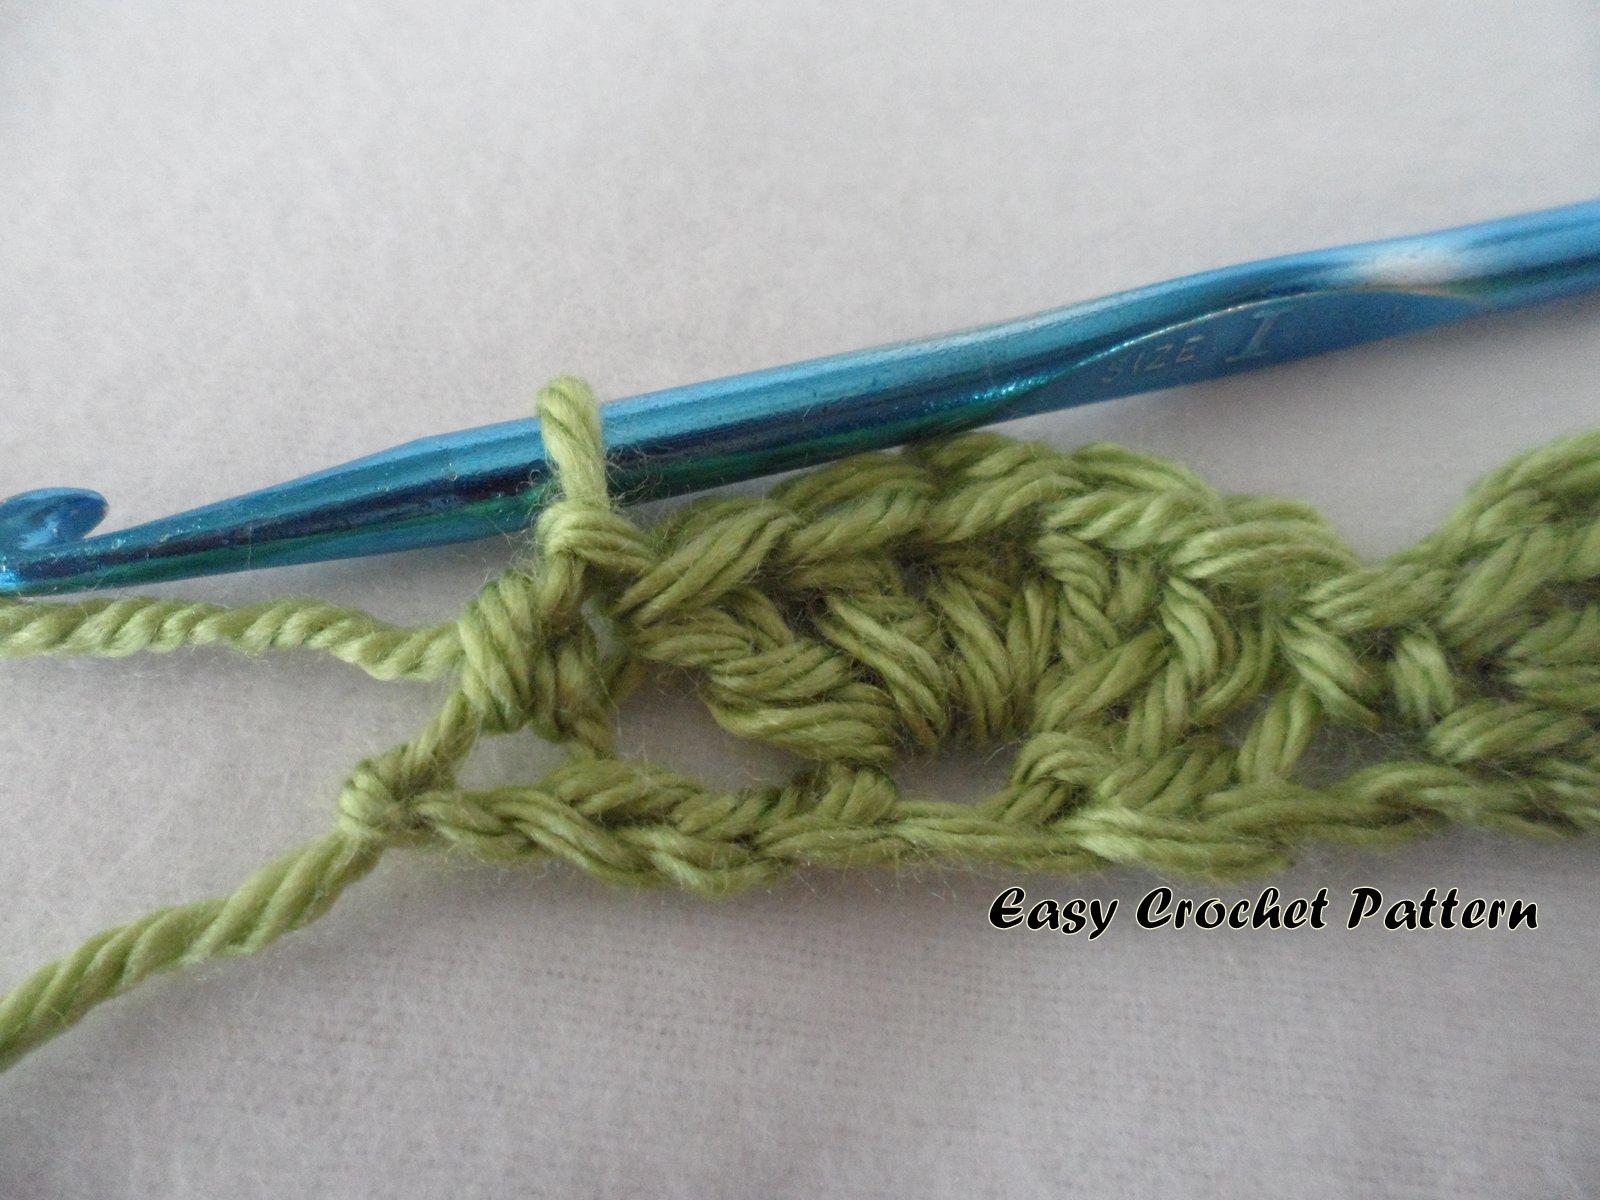 Easy Crochet Pattern: Crochet Shell Afghan Tutorial